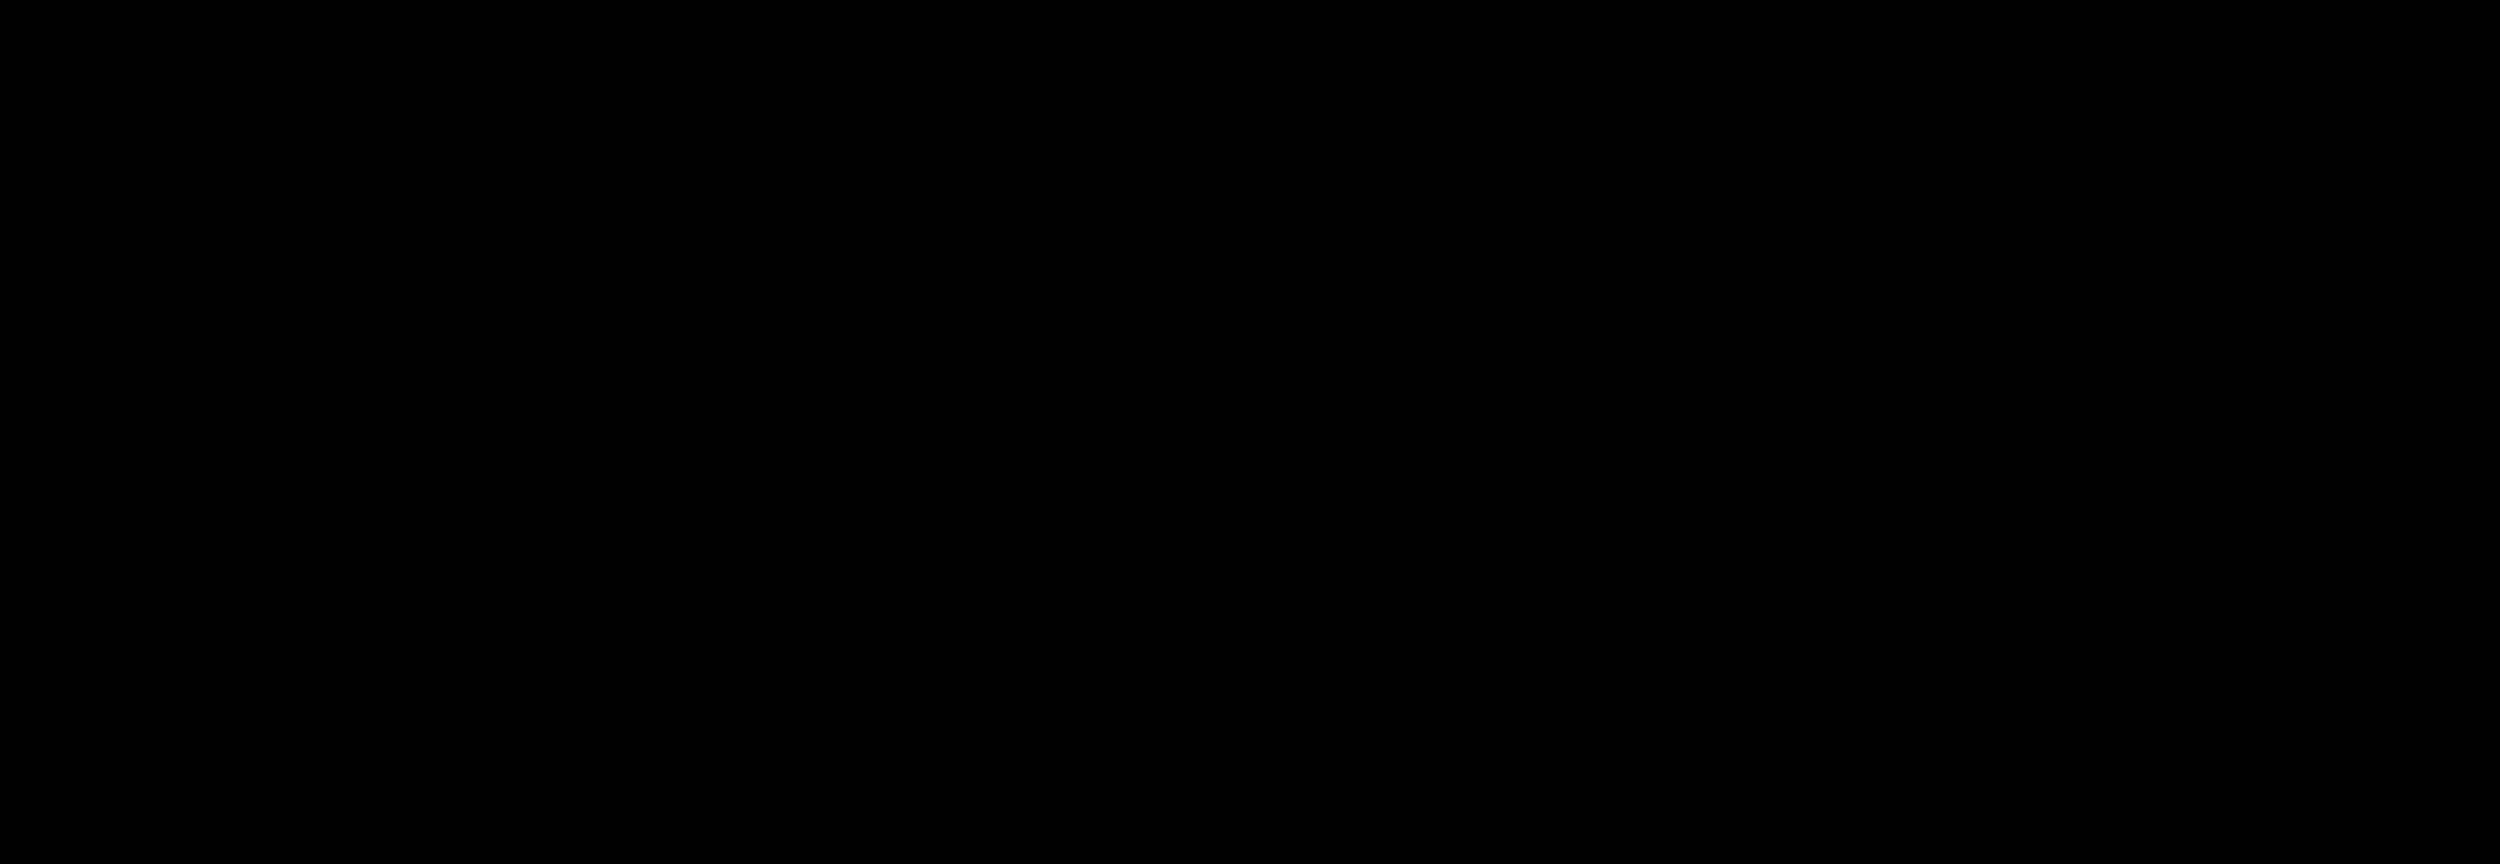 Longevity Consulting, LLC-logo (2).png